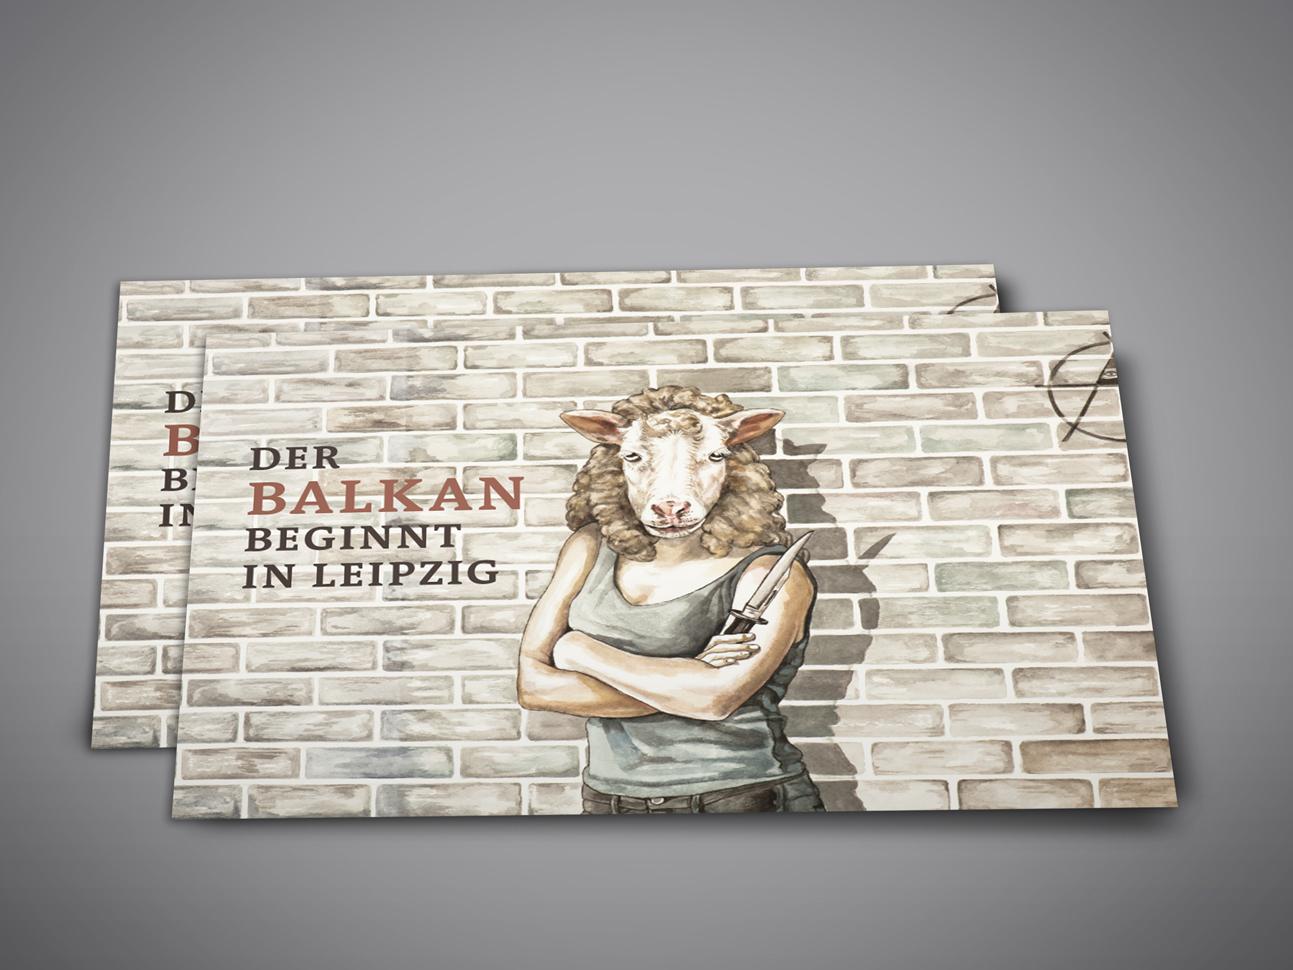 martin_zech_design_projekt_design_traduki_messestand_leipziger_buchmesse_2016_postkarte